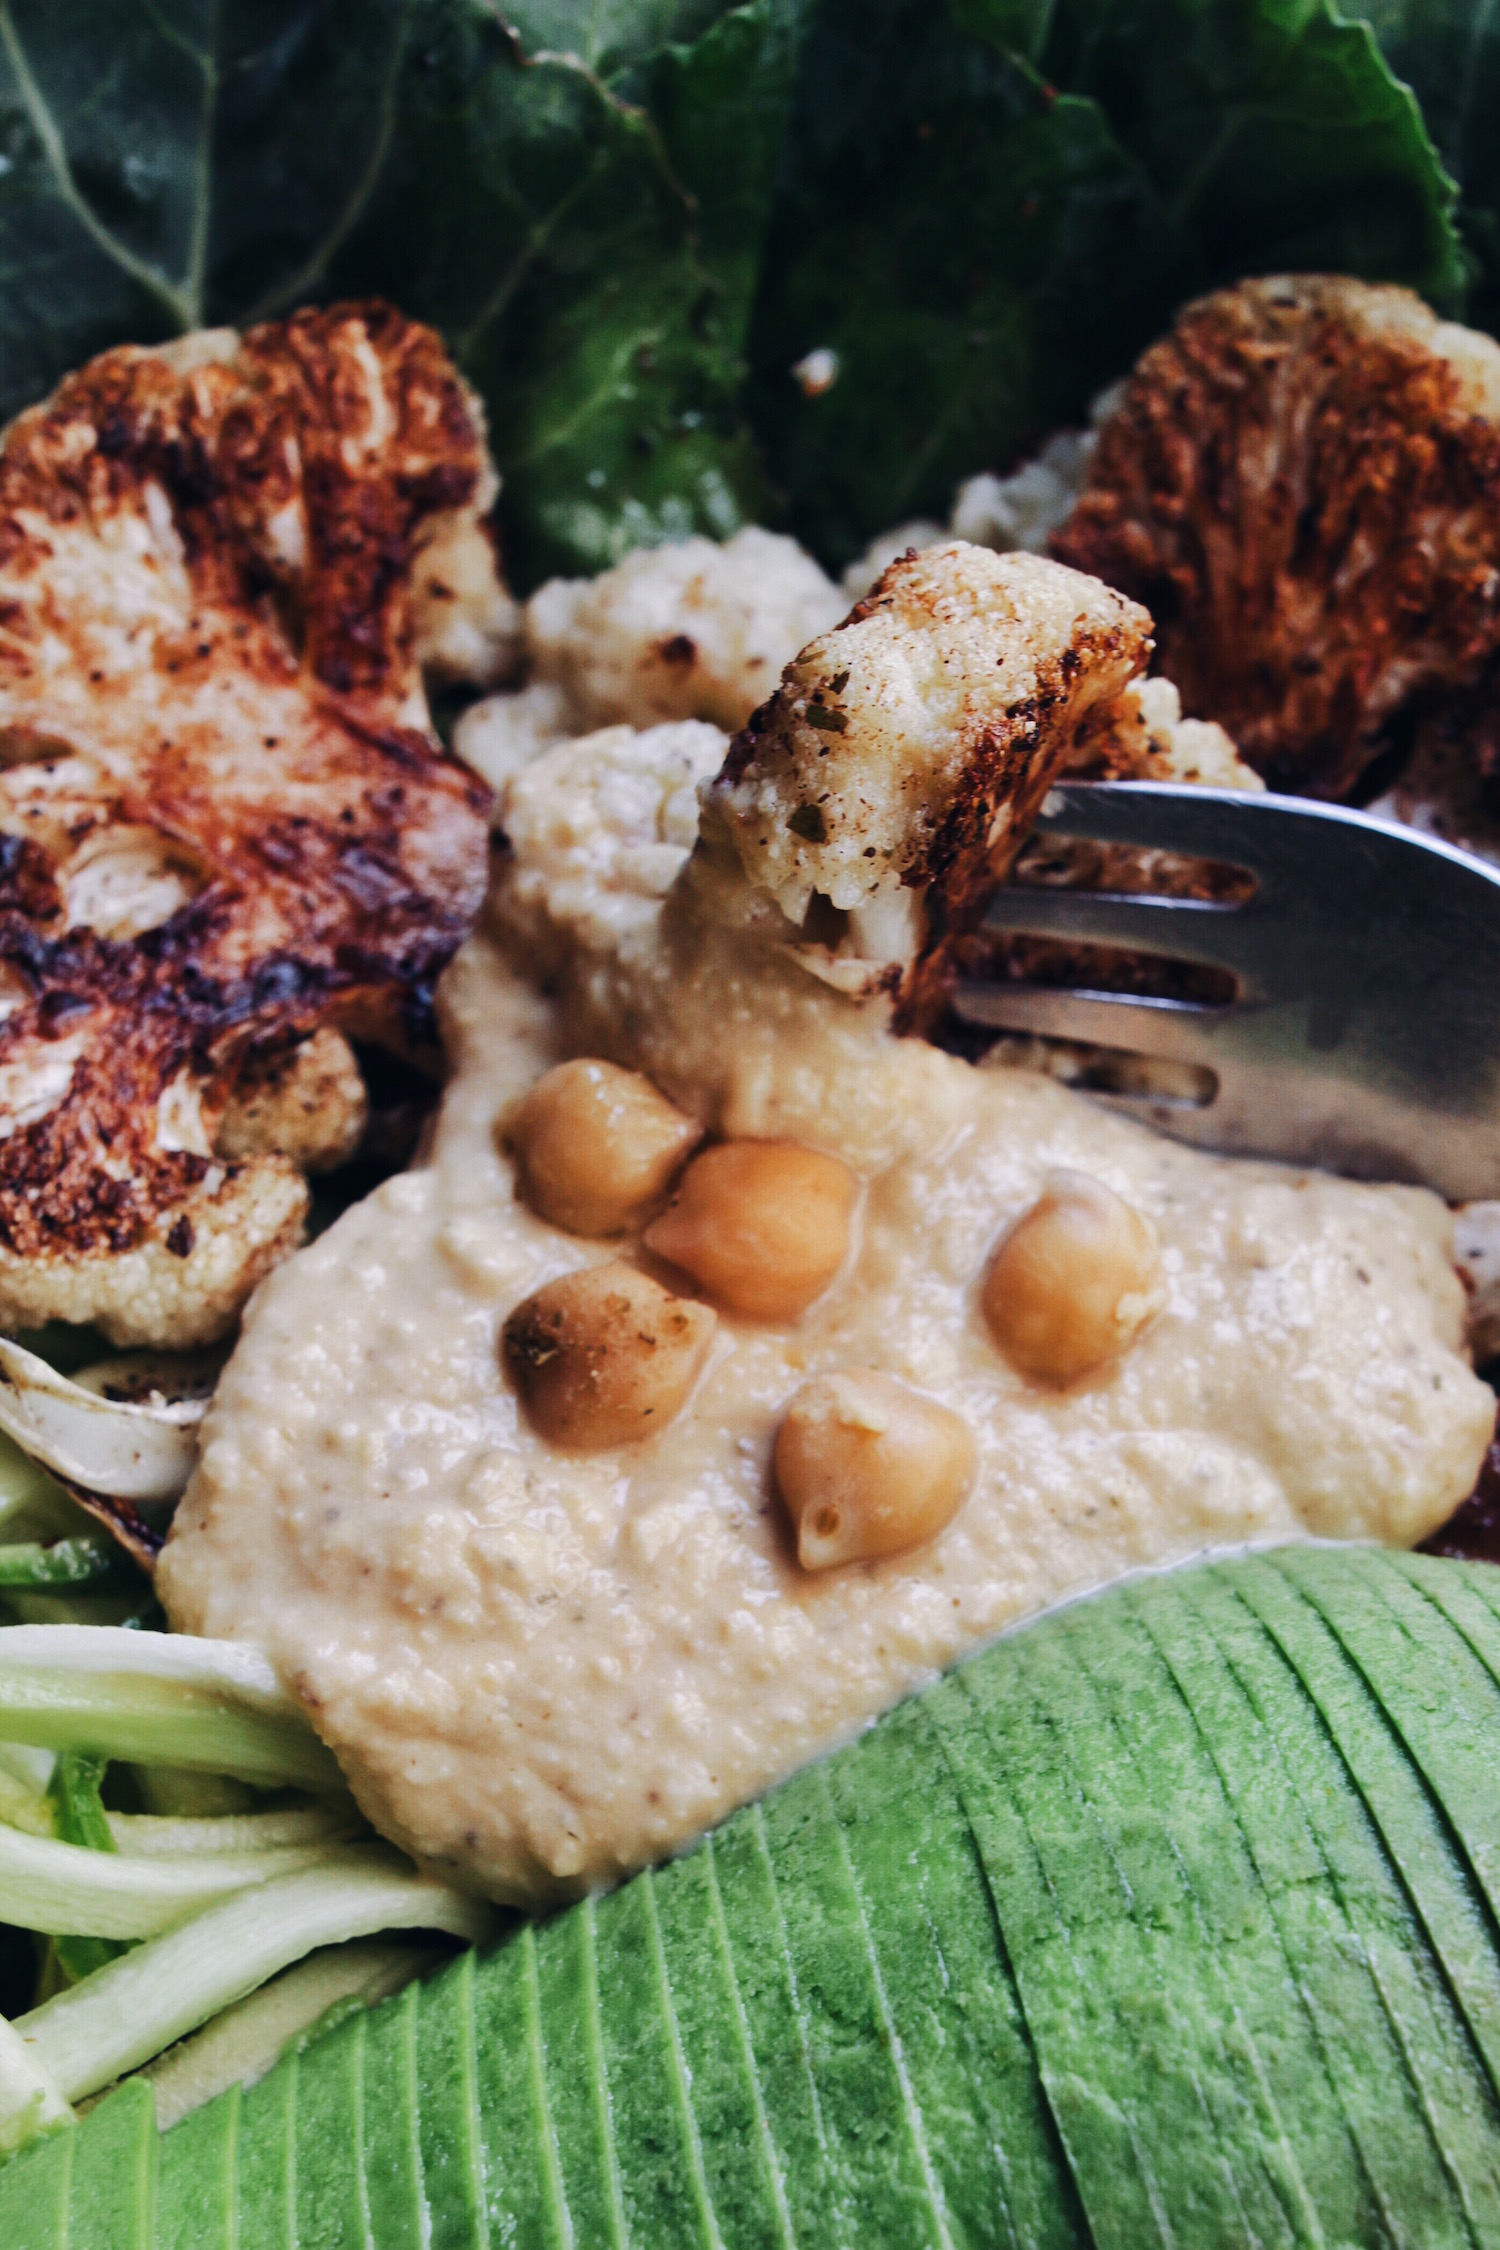 Roasted Cauliflower Bowl with Cinnamon and Cumin